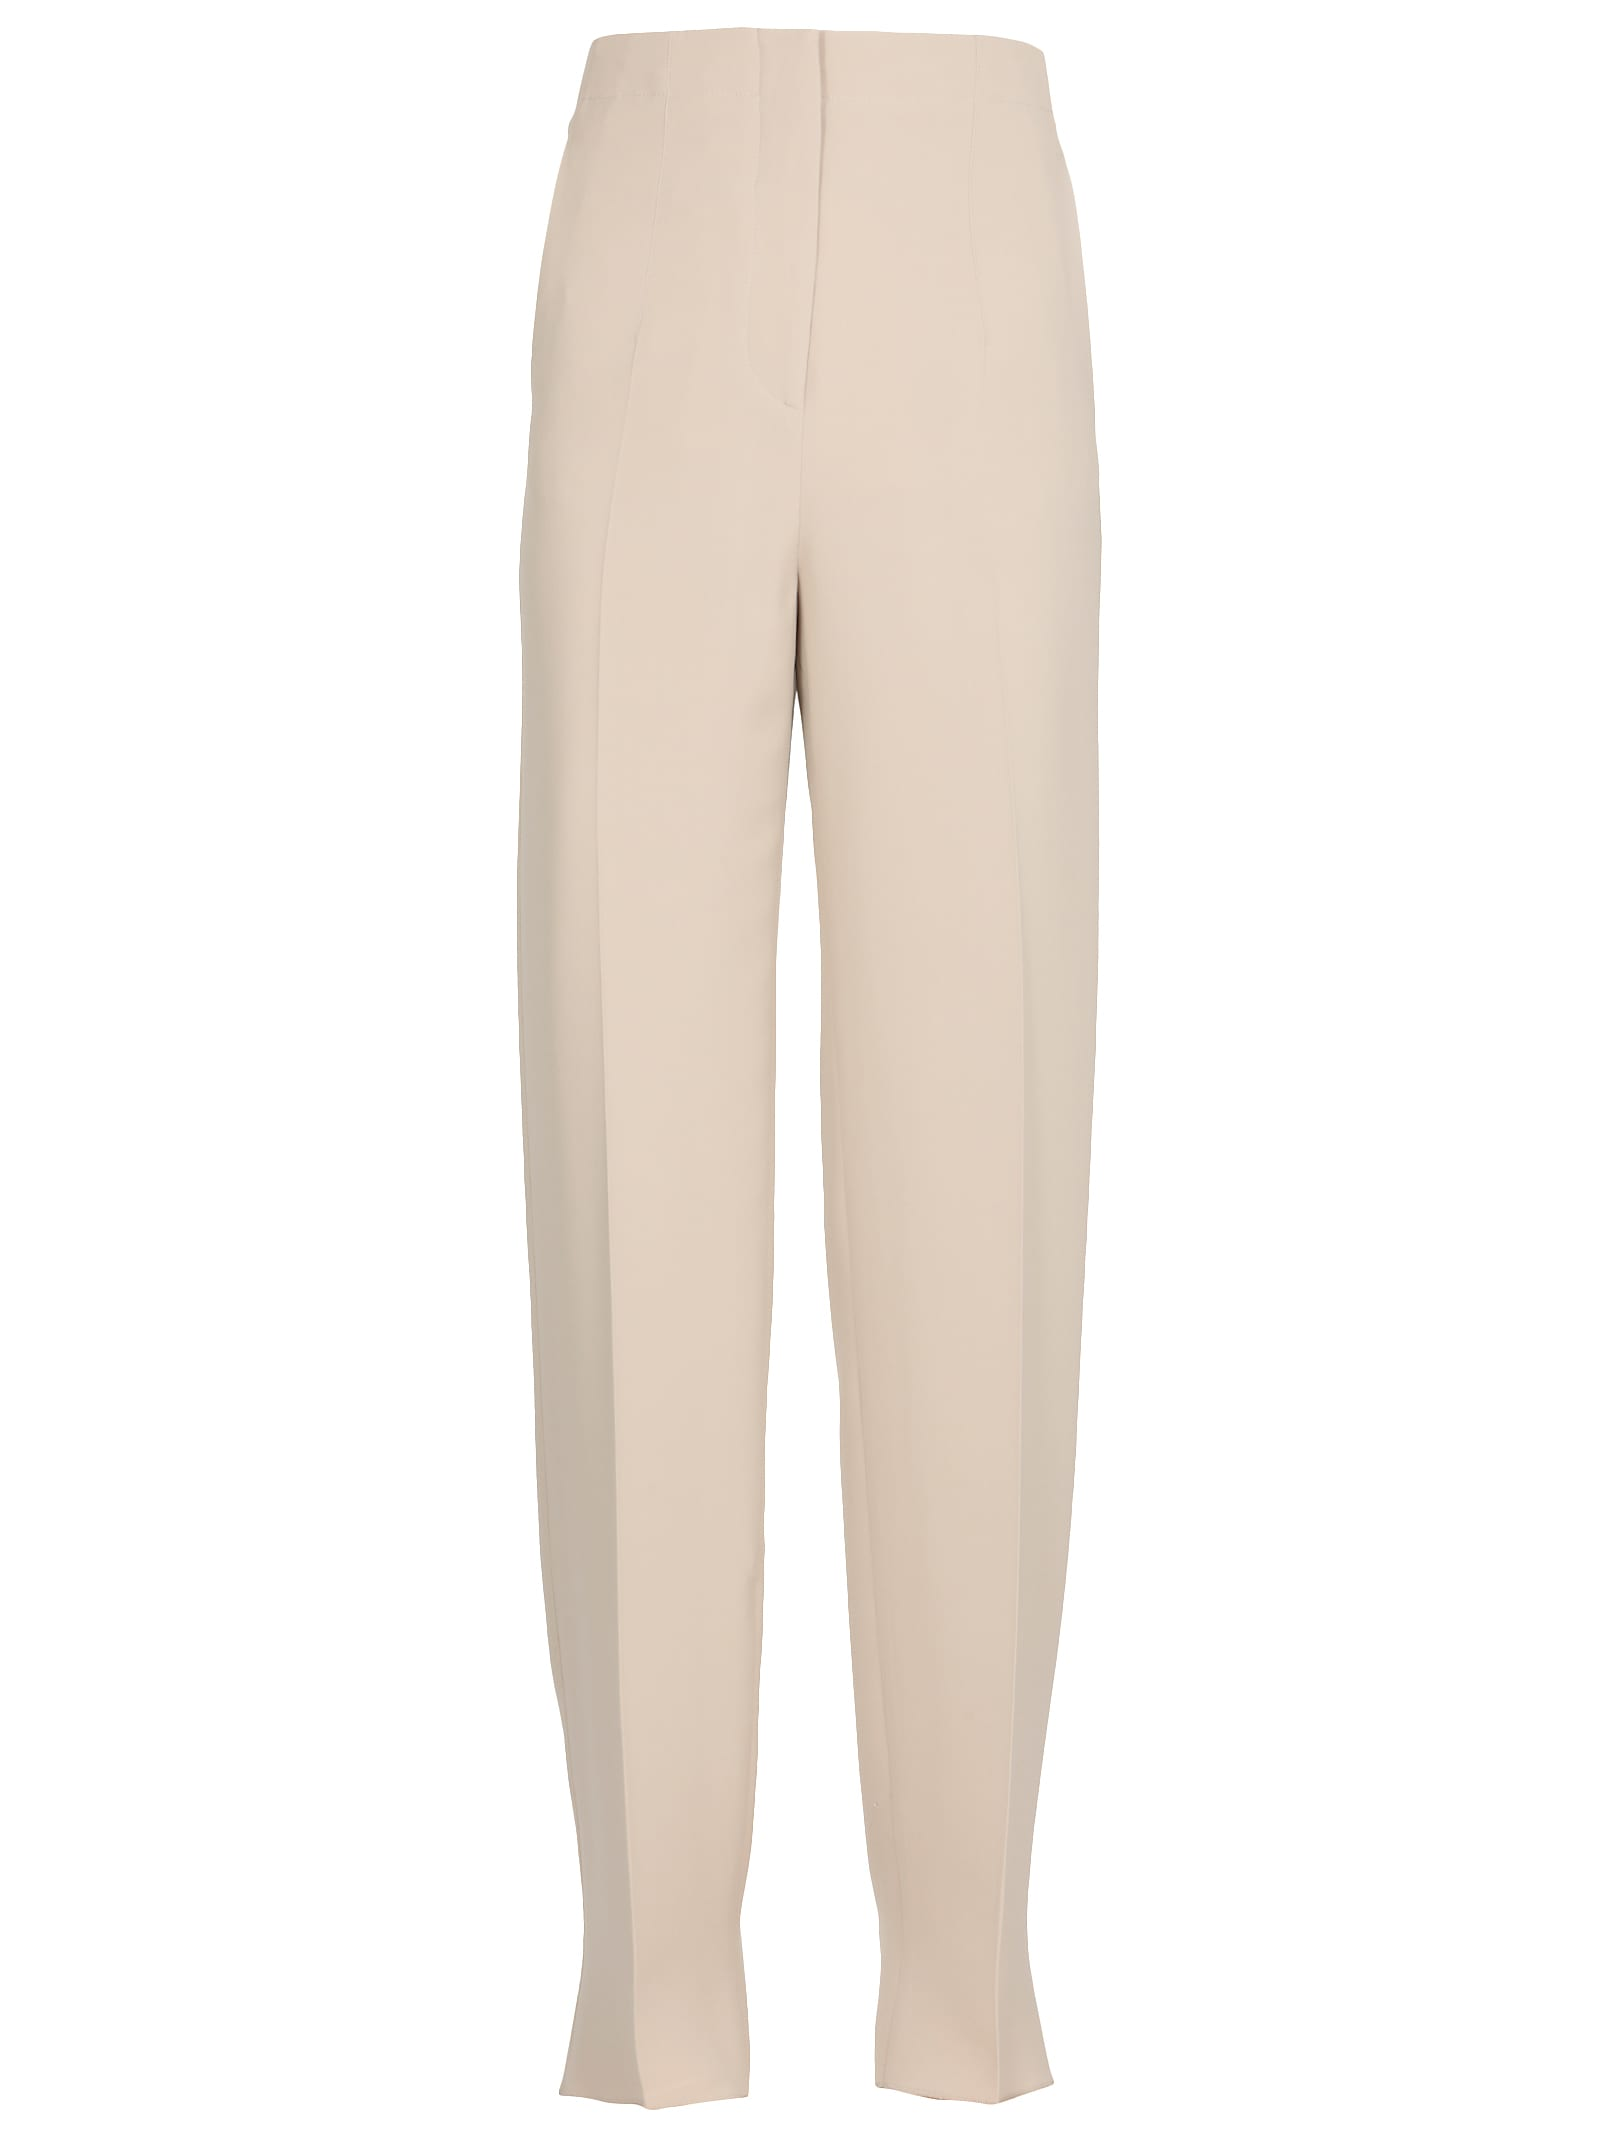 Buy Giorgio Armani Silk Dress online, shop Giorgio Armani with free shipping